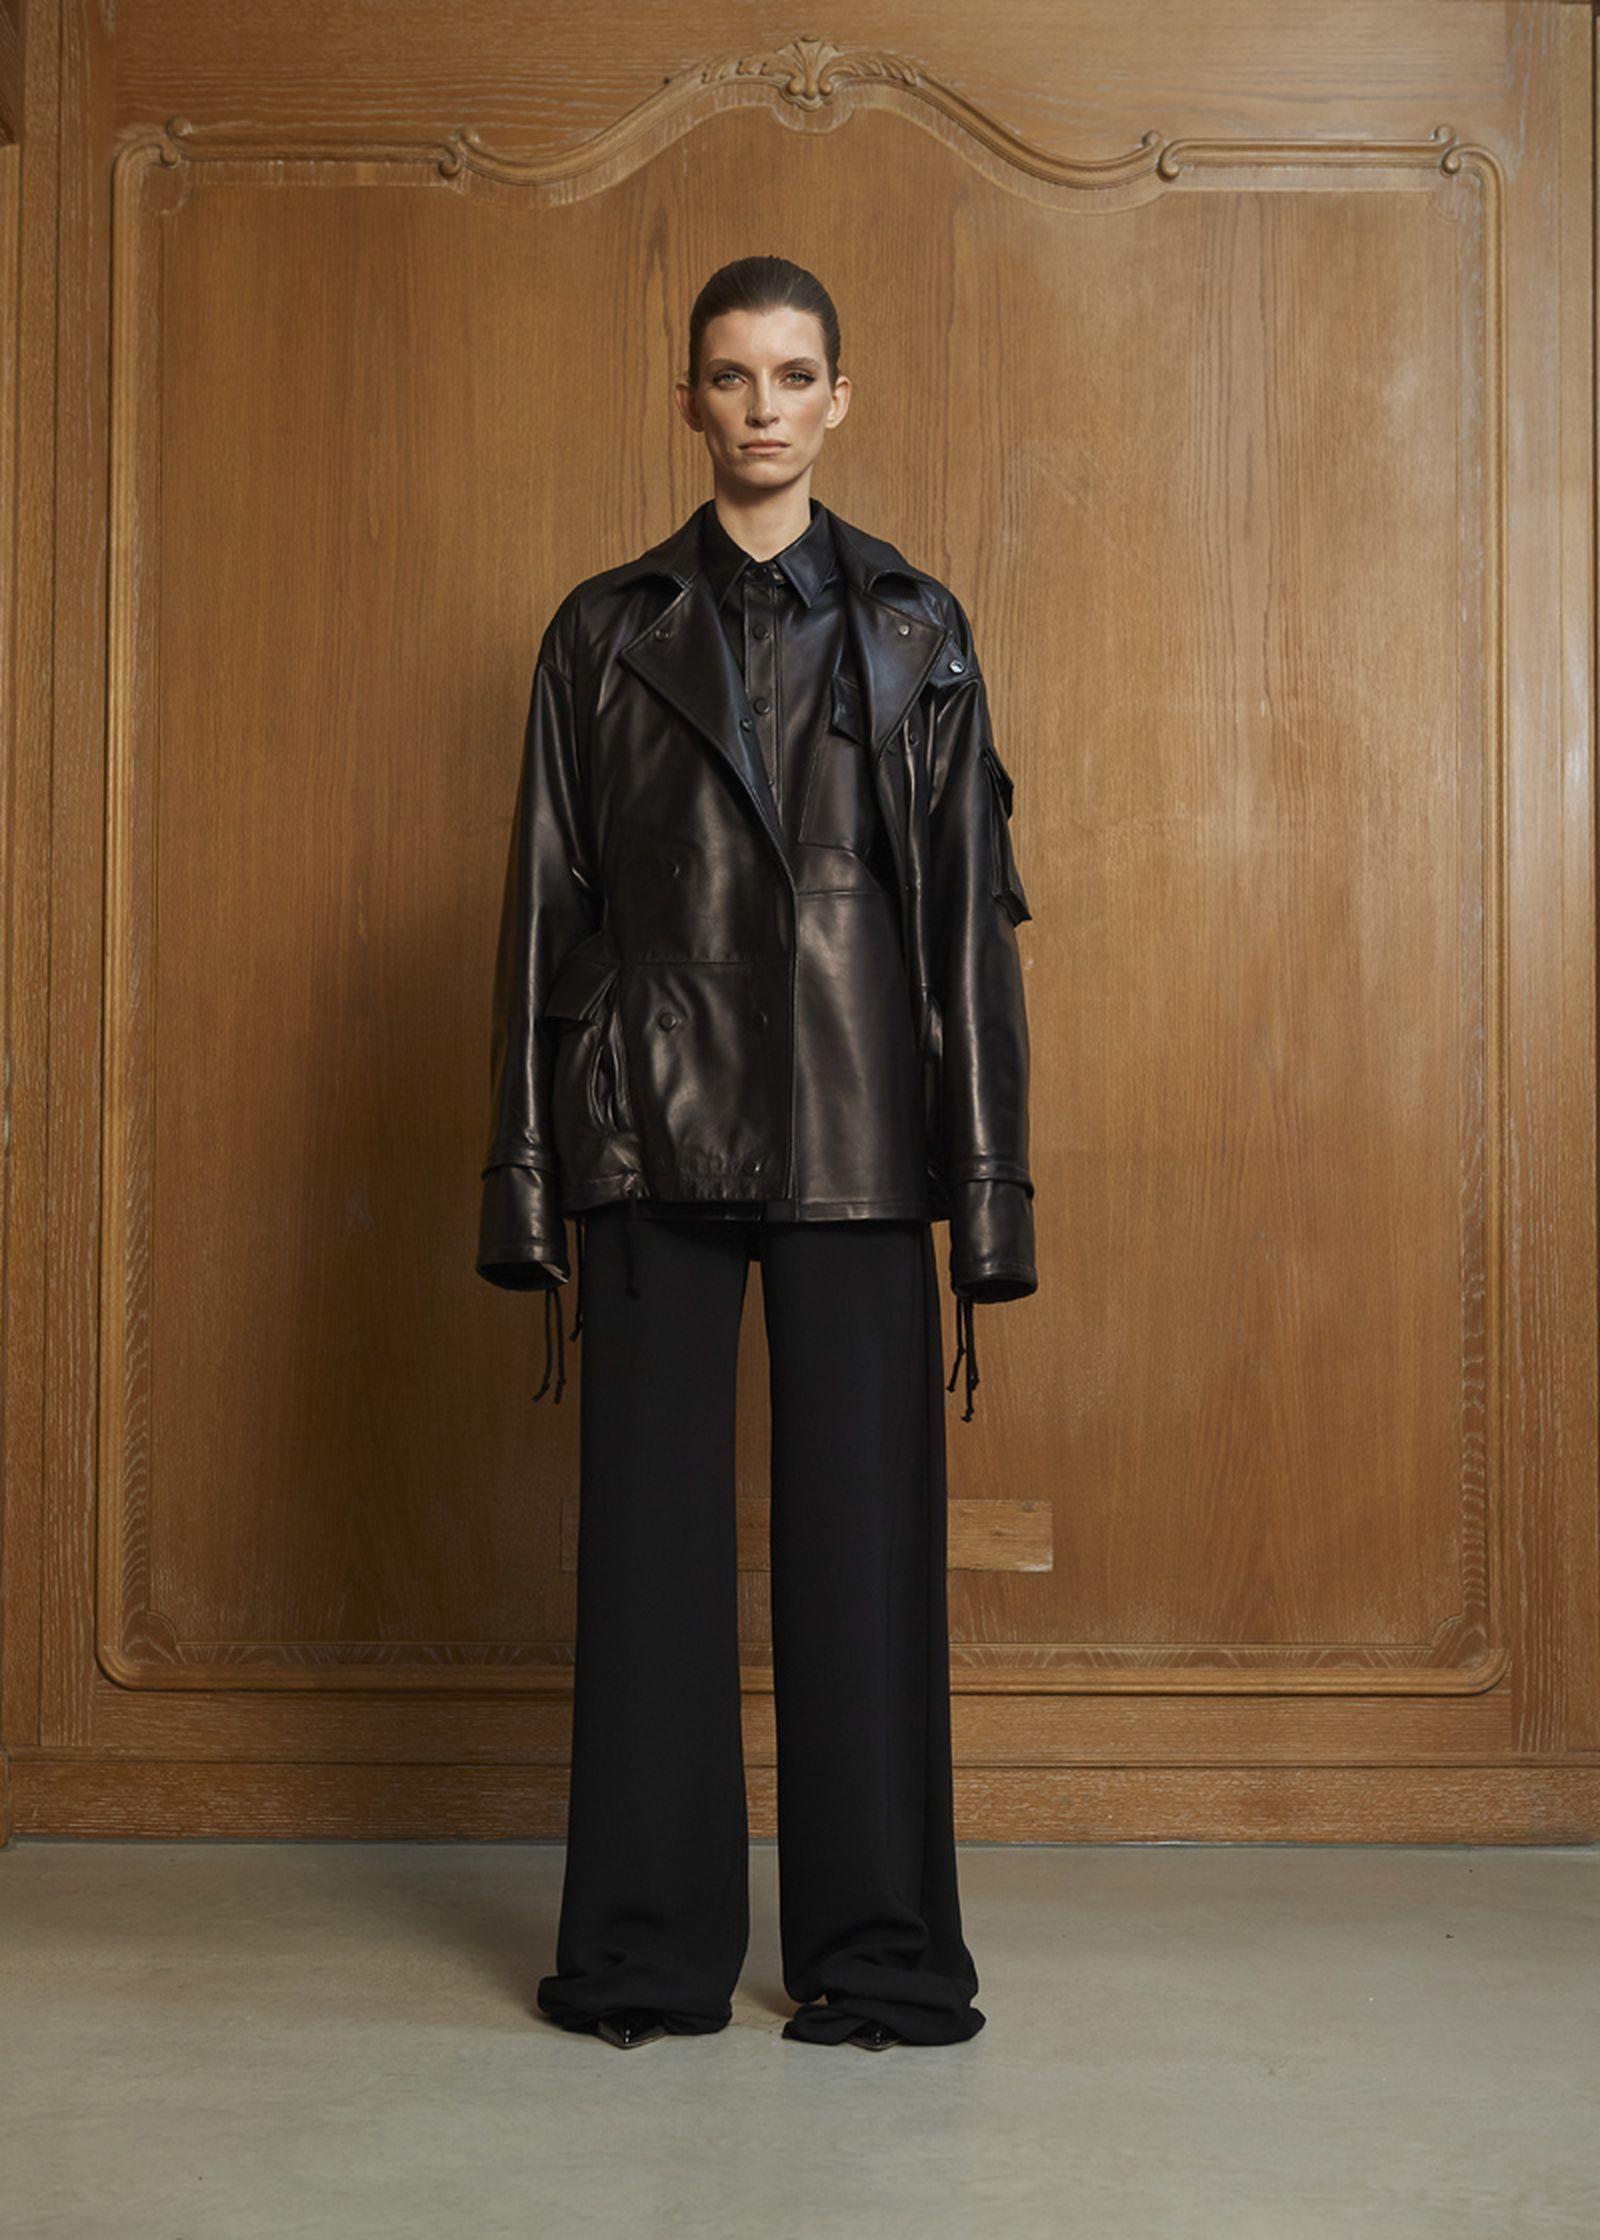 032c-rtw-womenswear-collection-paris-16